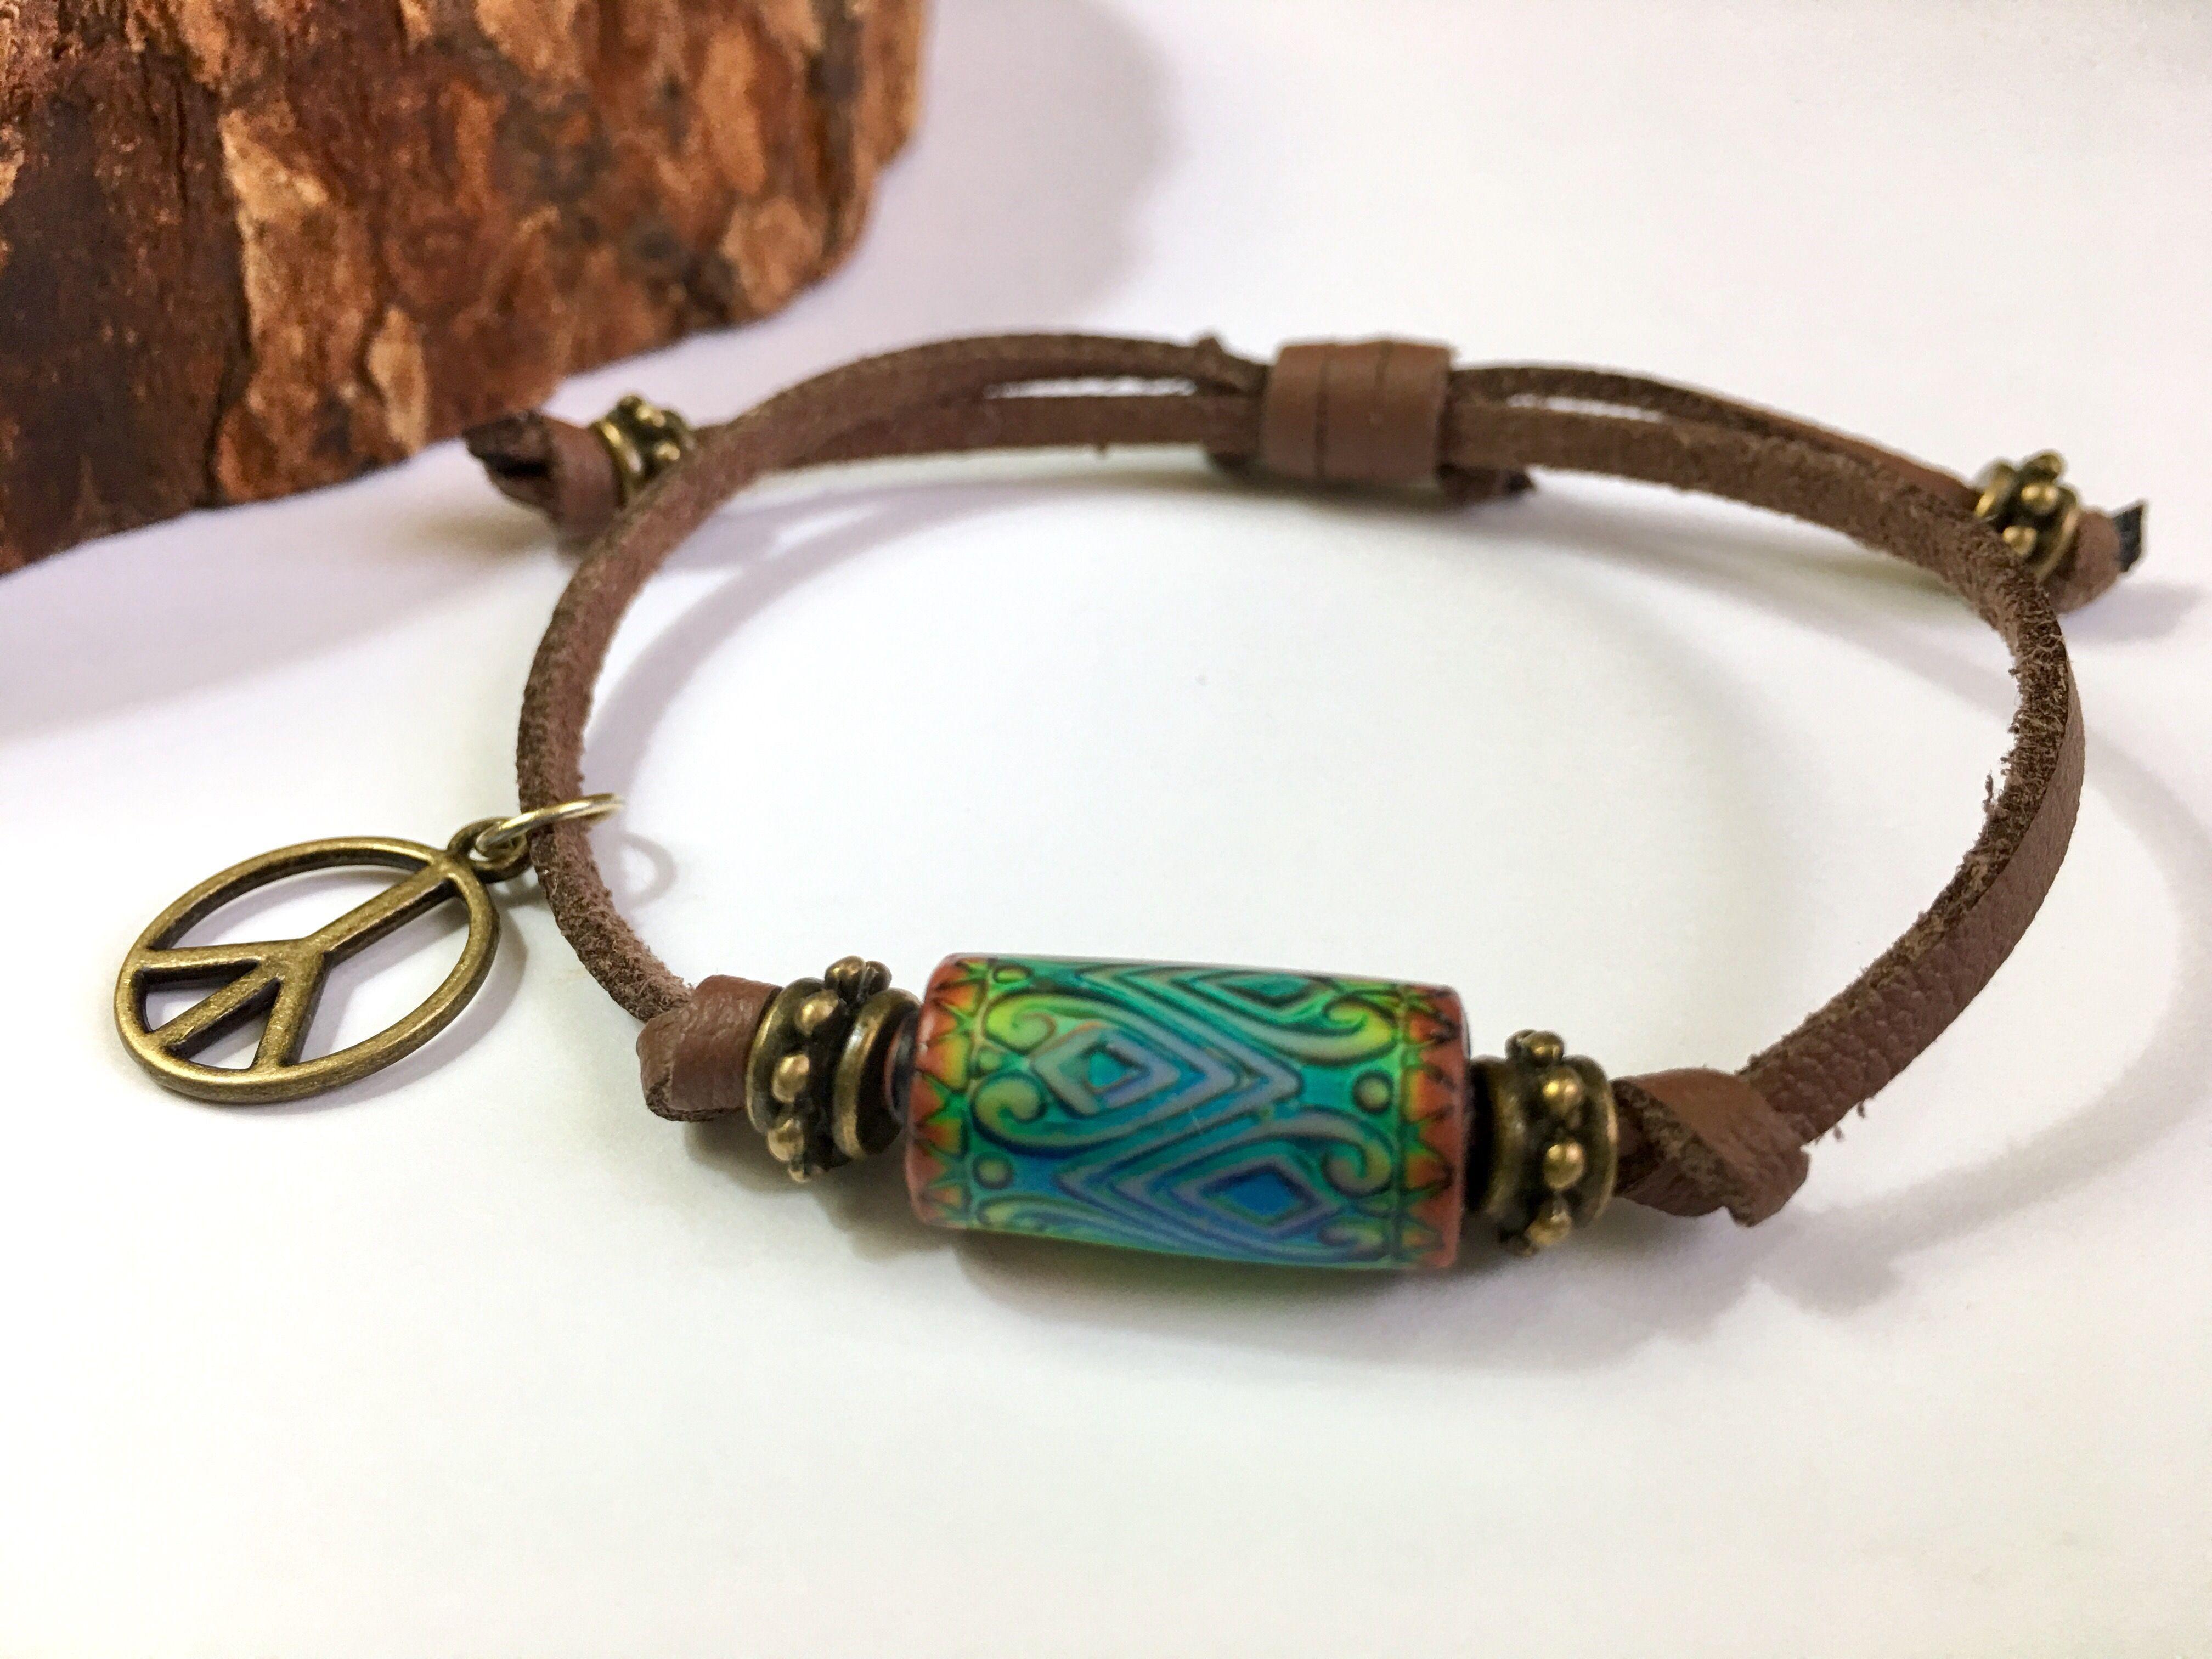 Retromod colorchanging mood bracelet with peace charm handmade